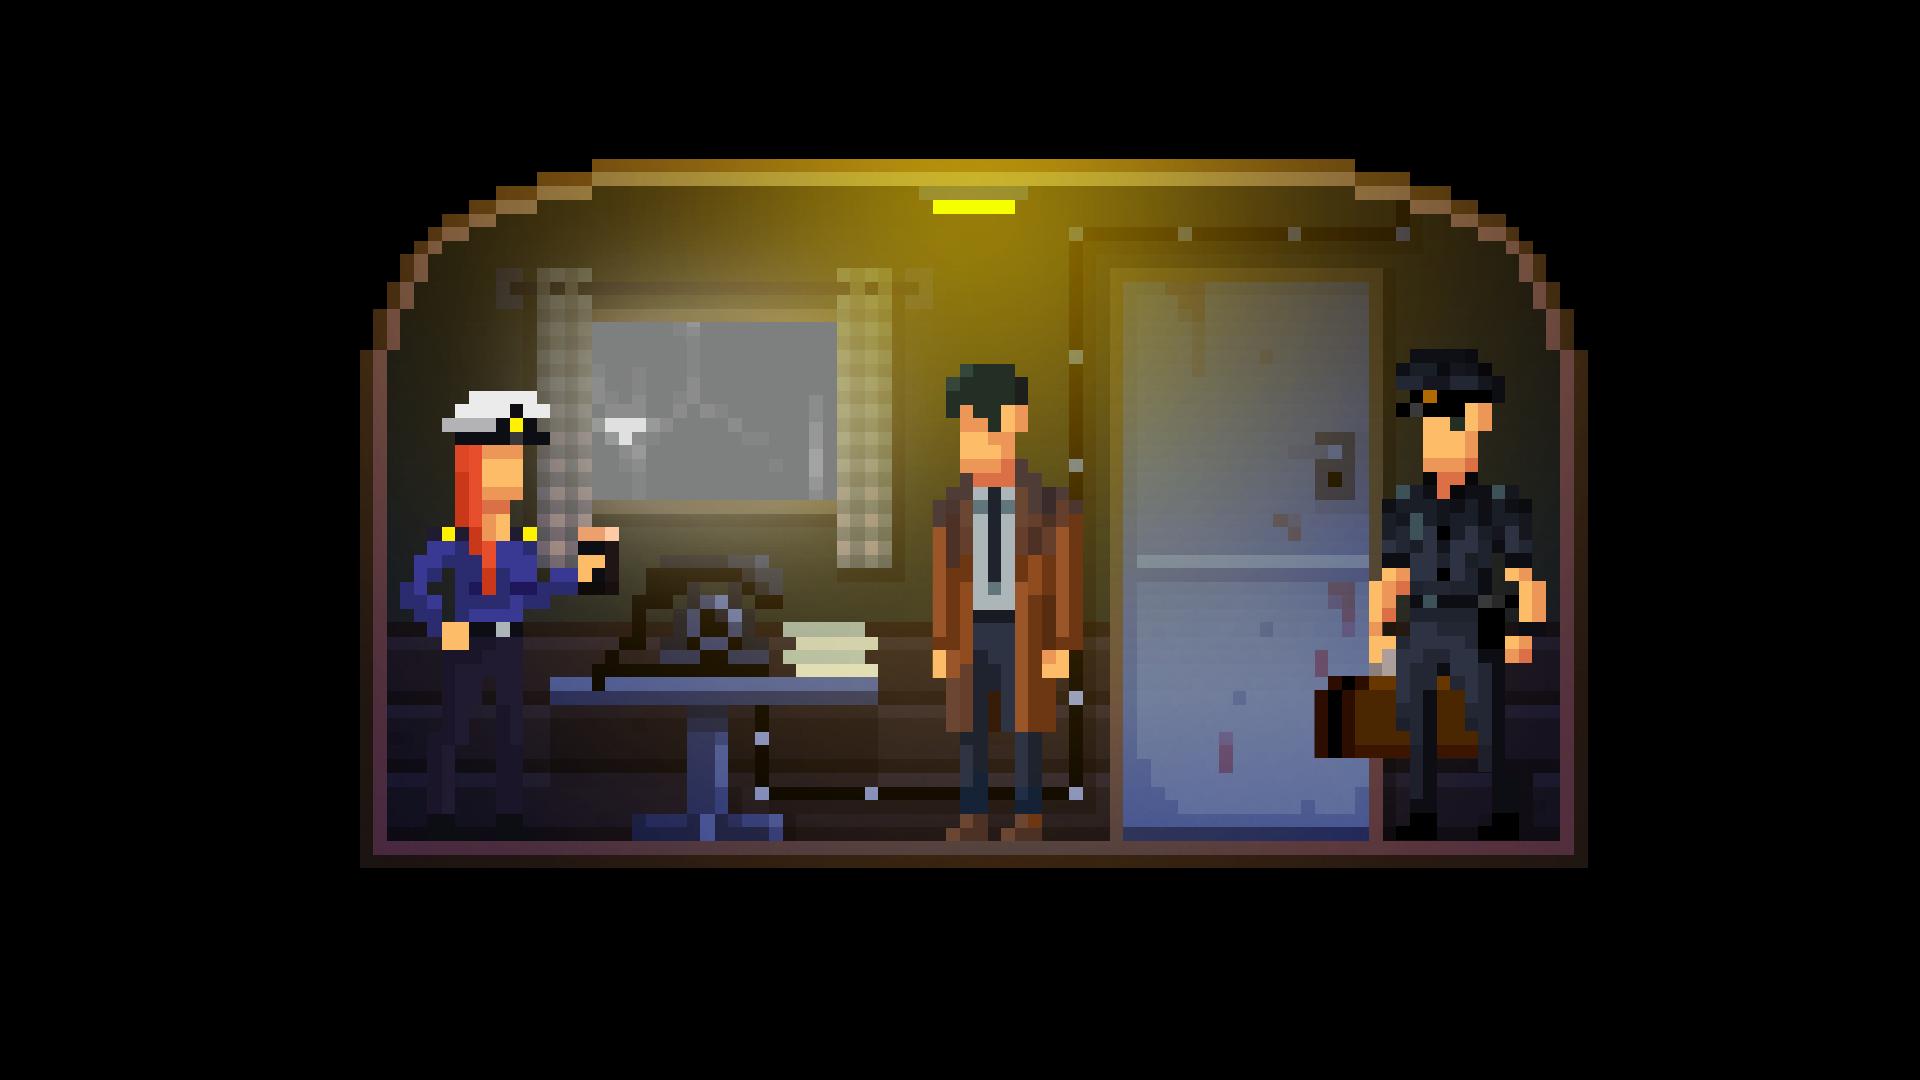 The Darkest Detective A Fumble in the Dark